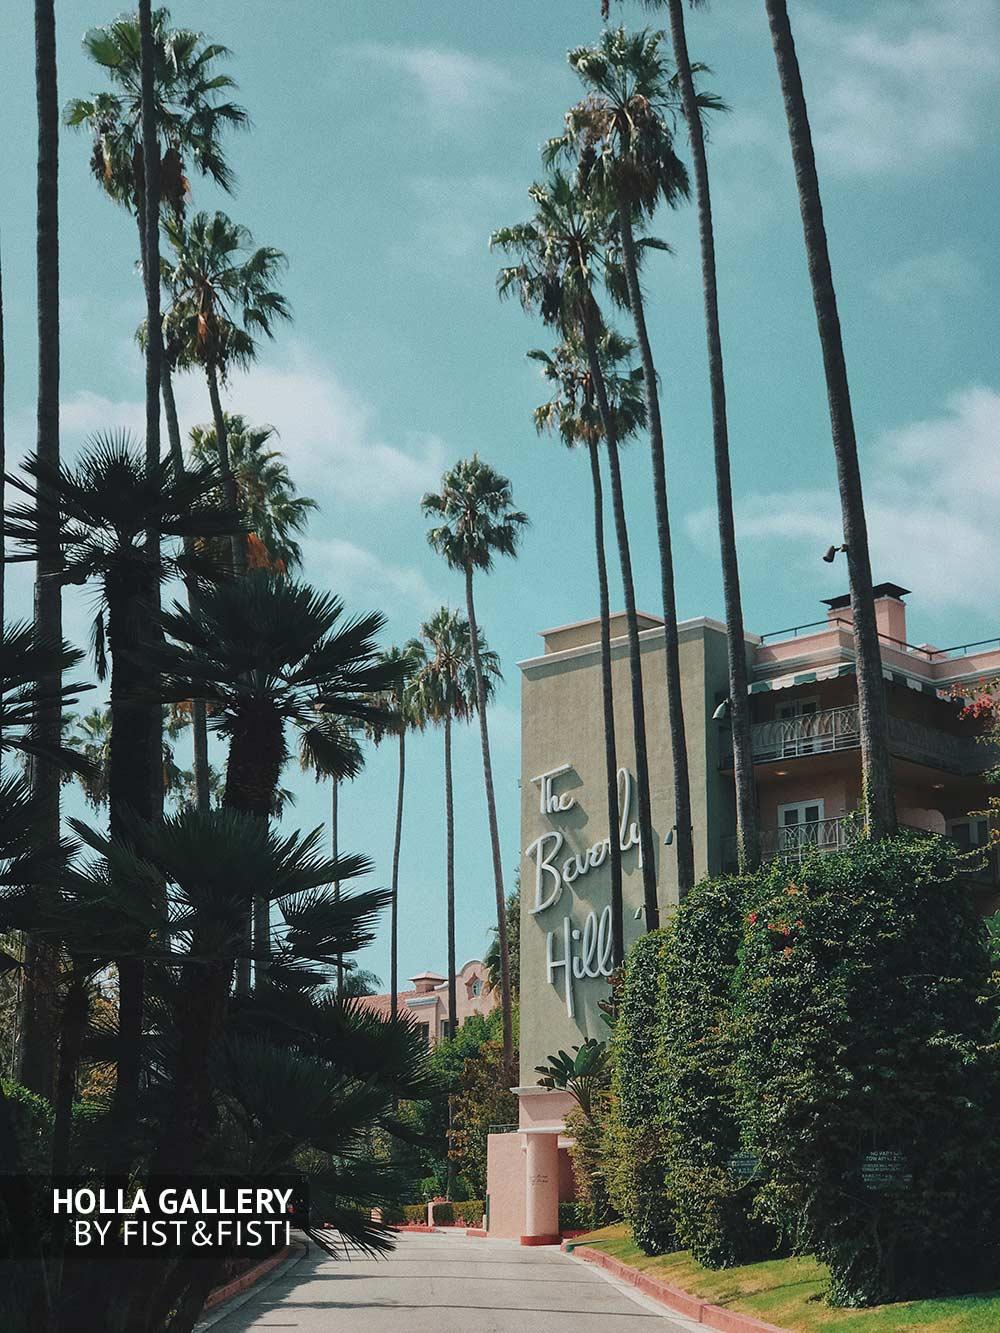 Beverly Hills, отель, пальмы, солнце